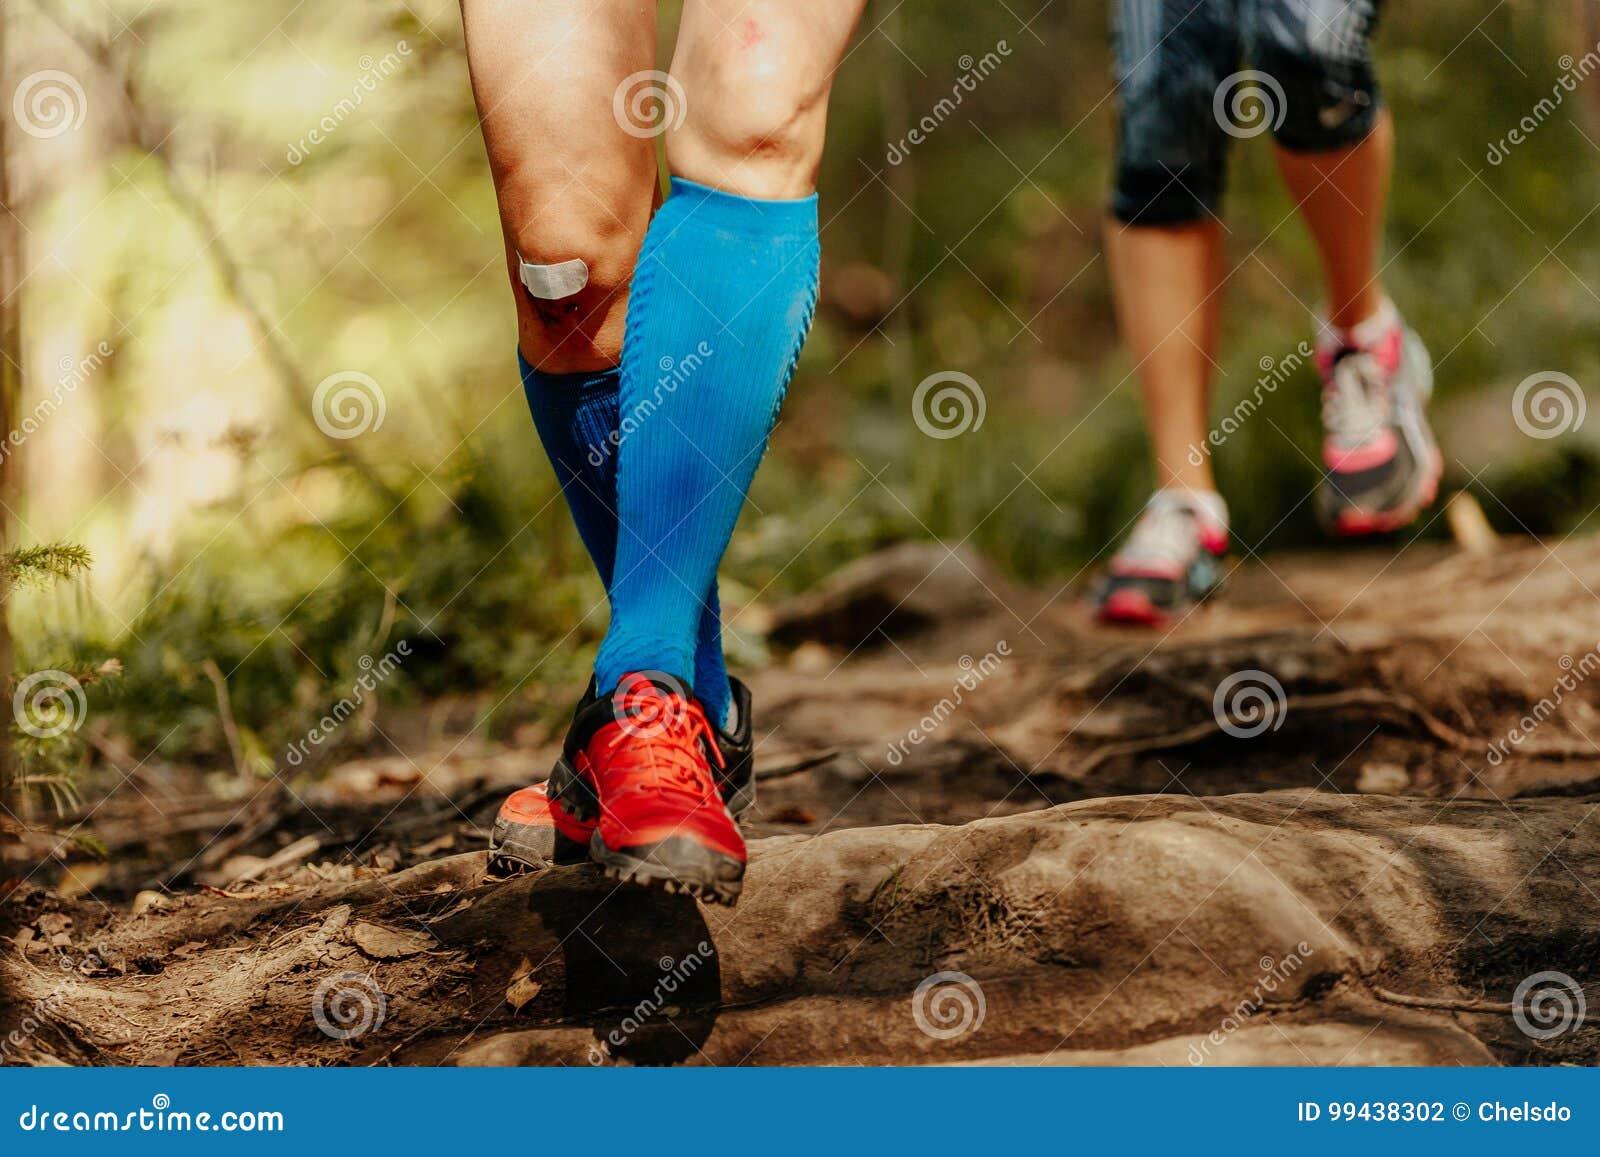 1e887d04389e5 Woman feet runner running rocks in blue compression socks